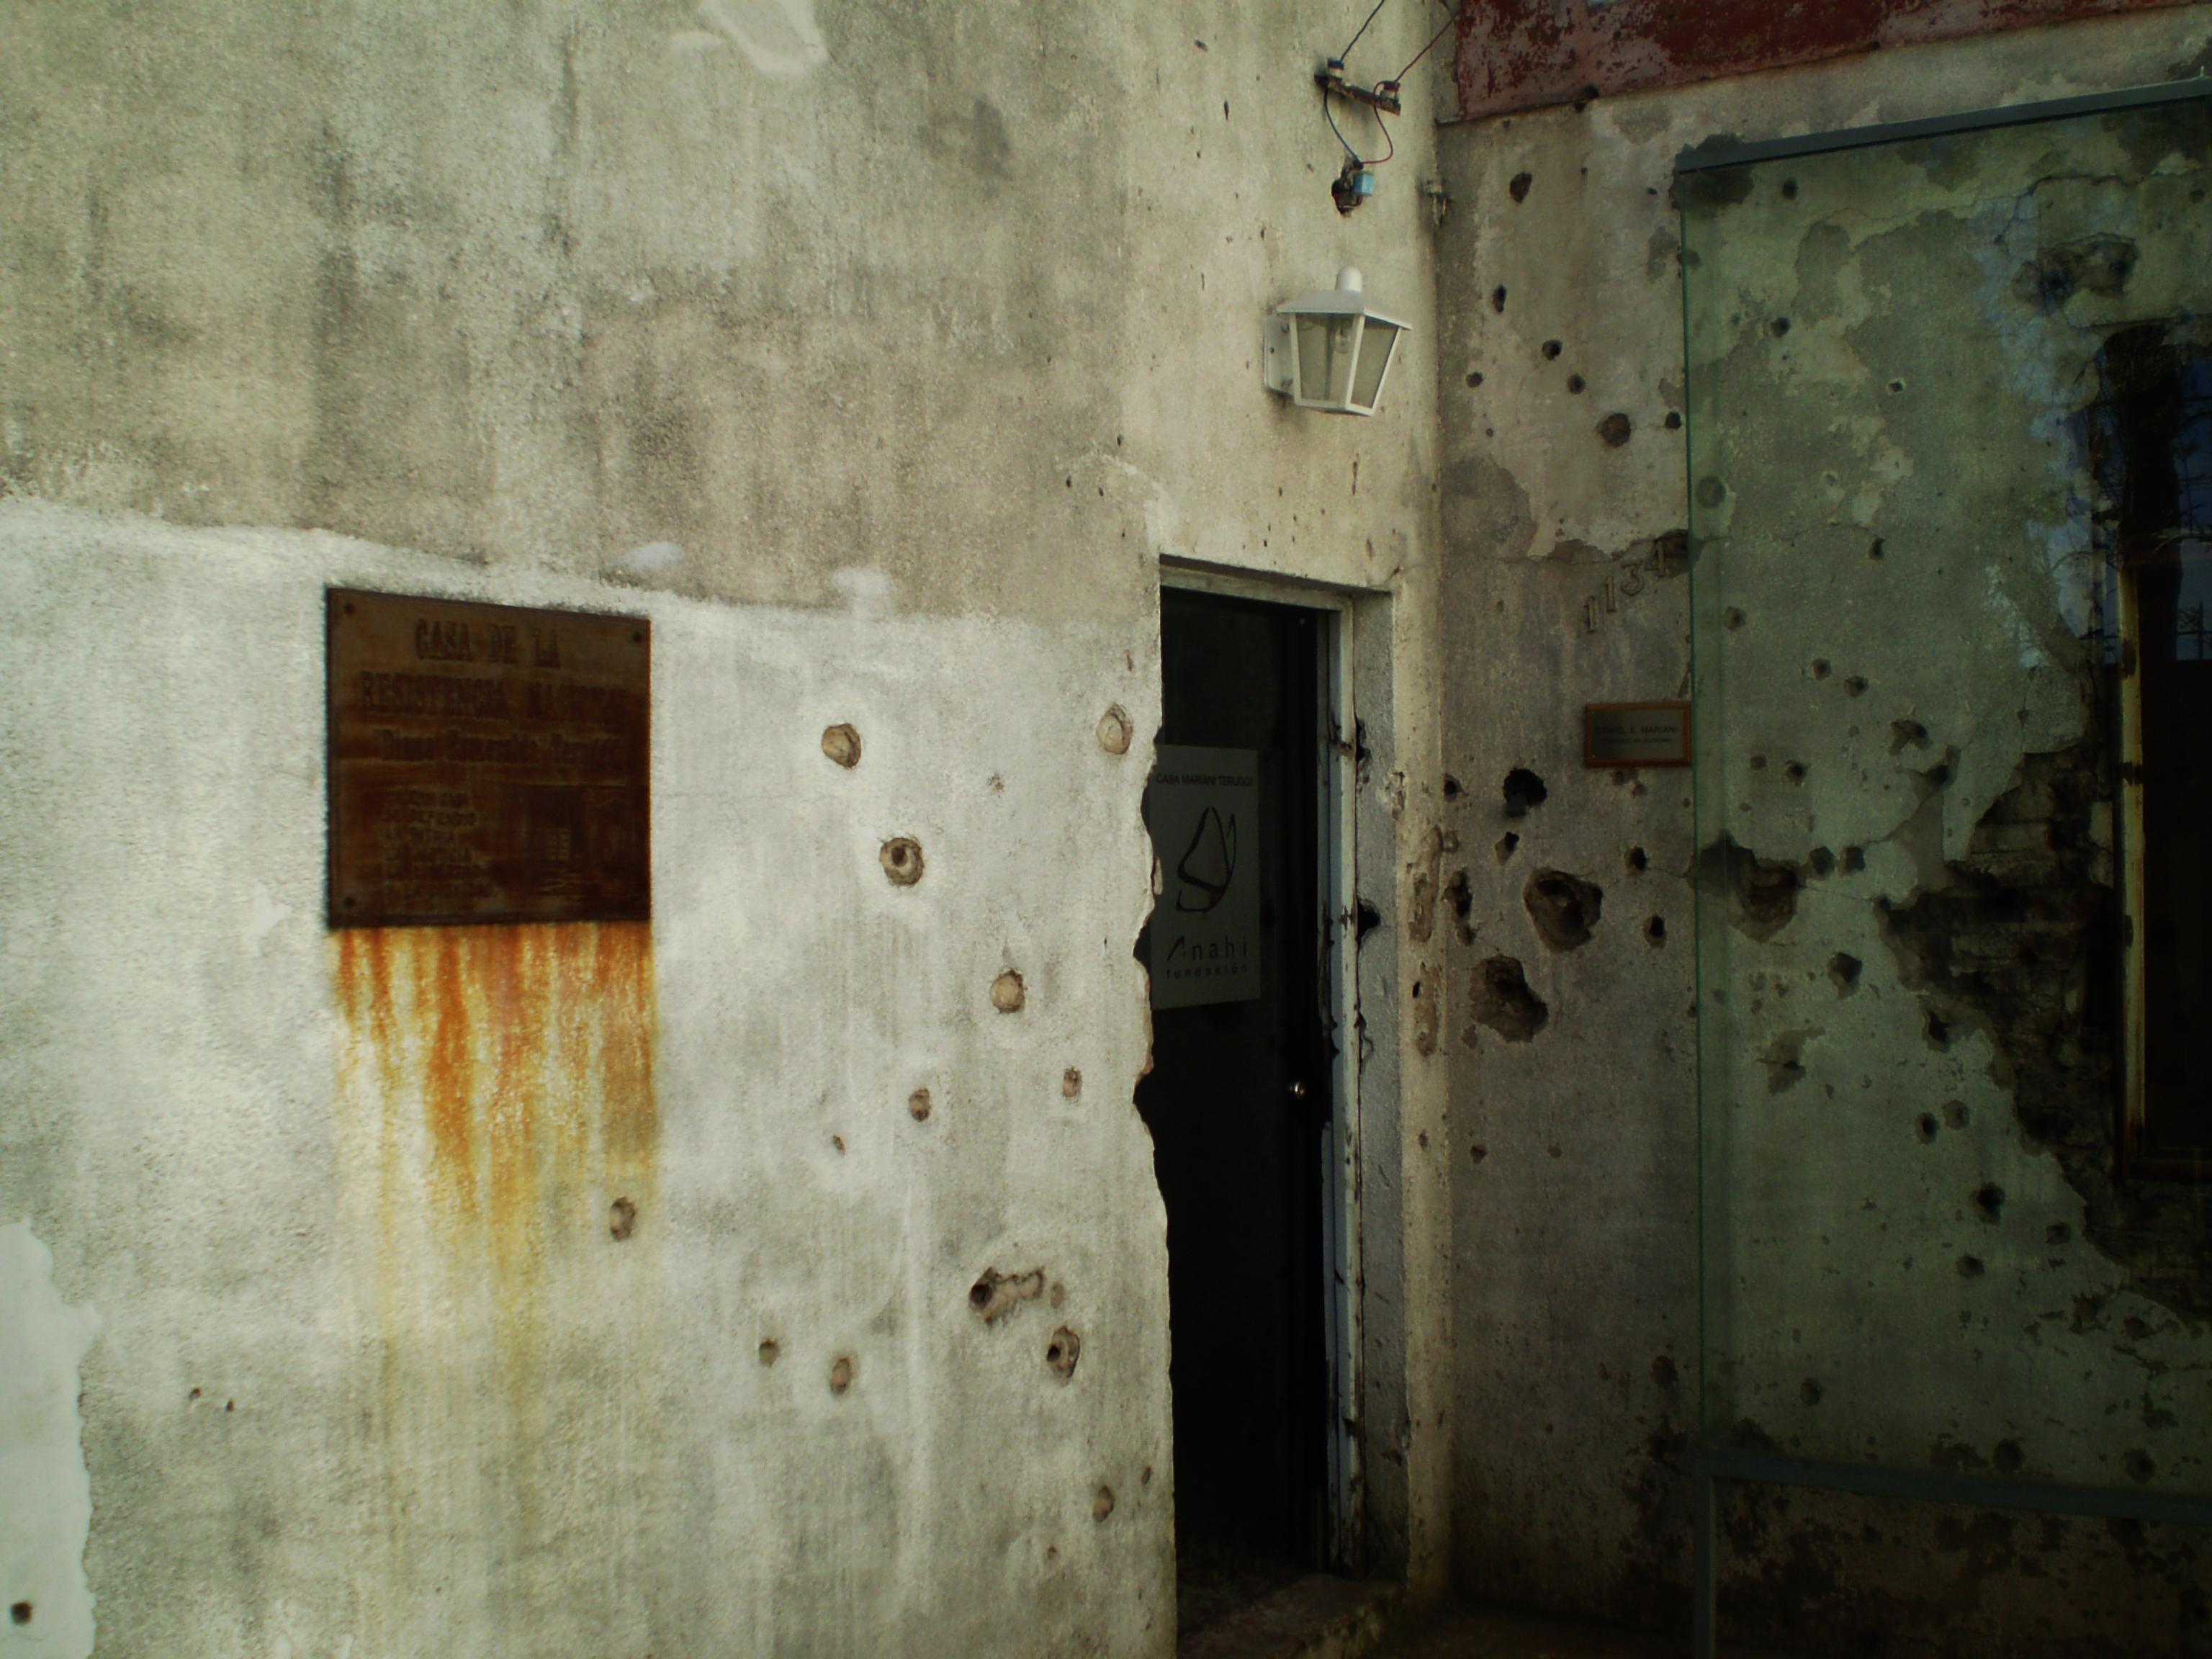 Evidence of armed violence-Mariani Teruggi House